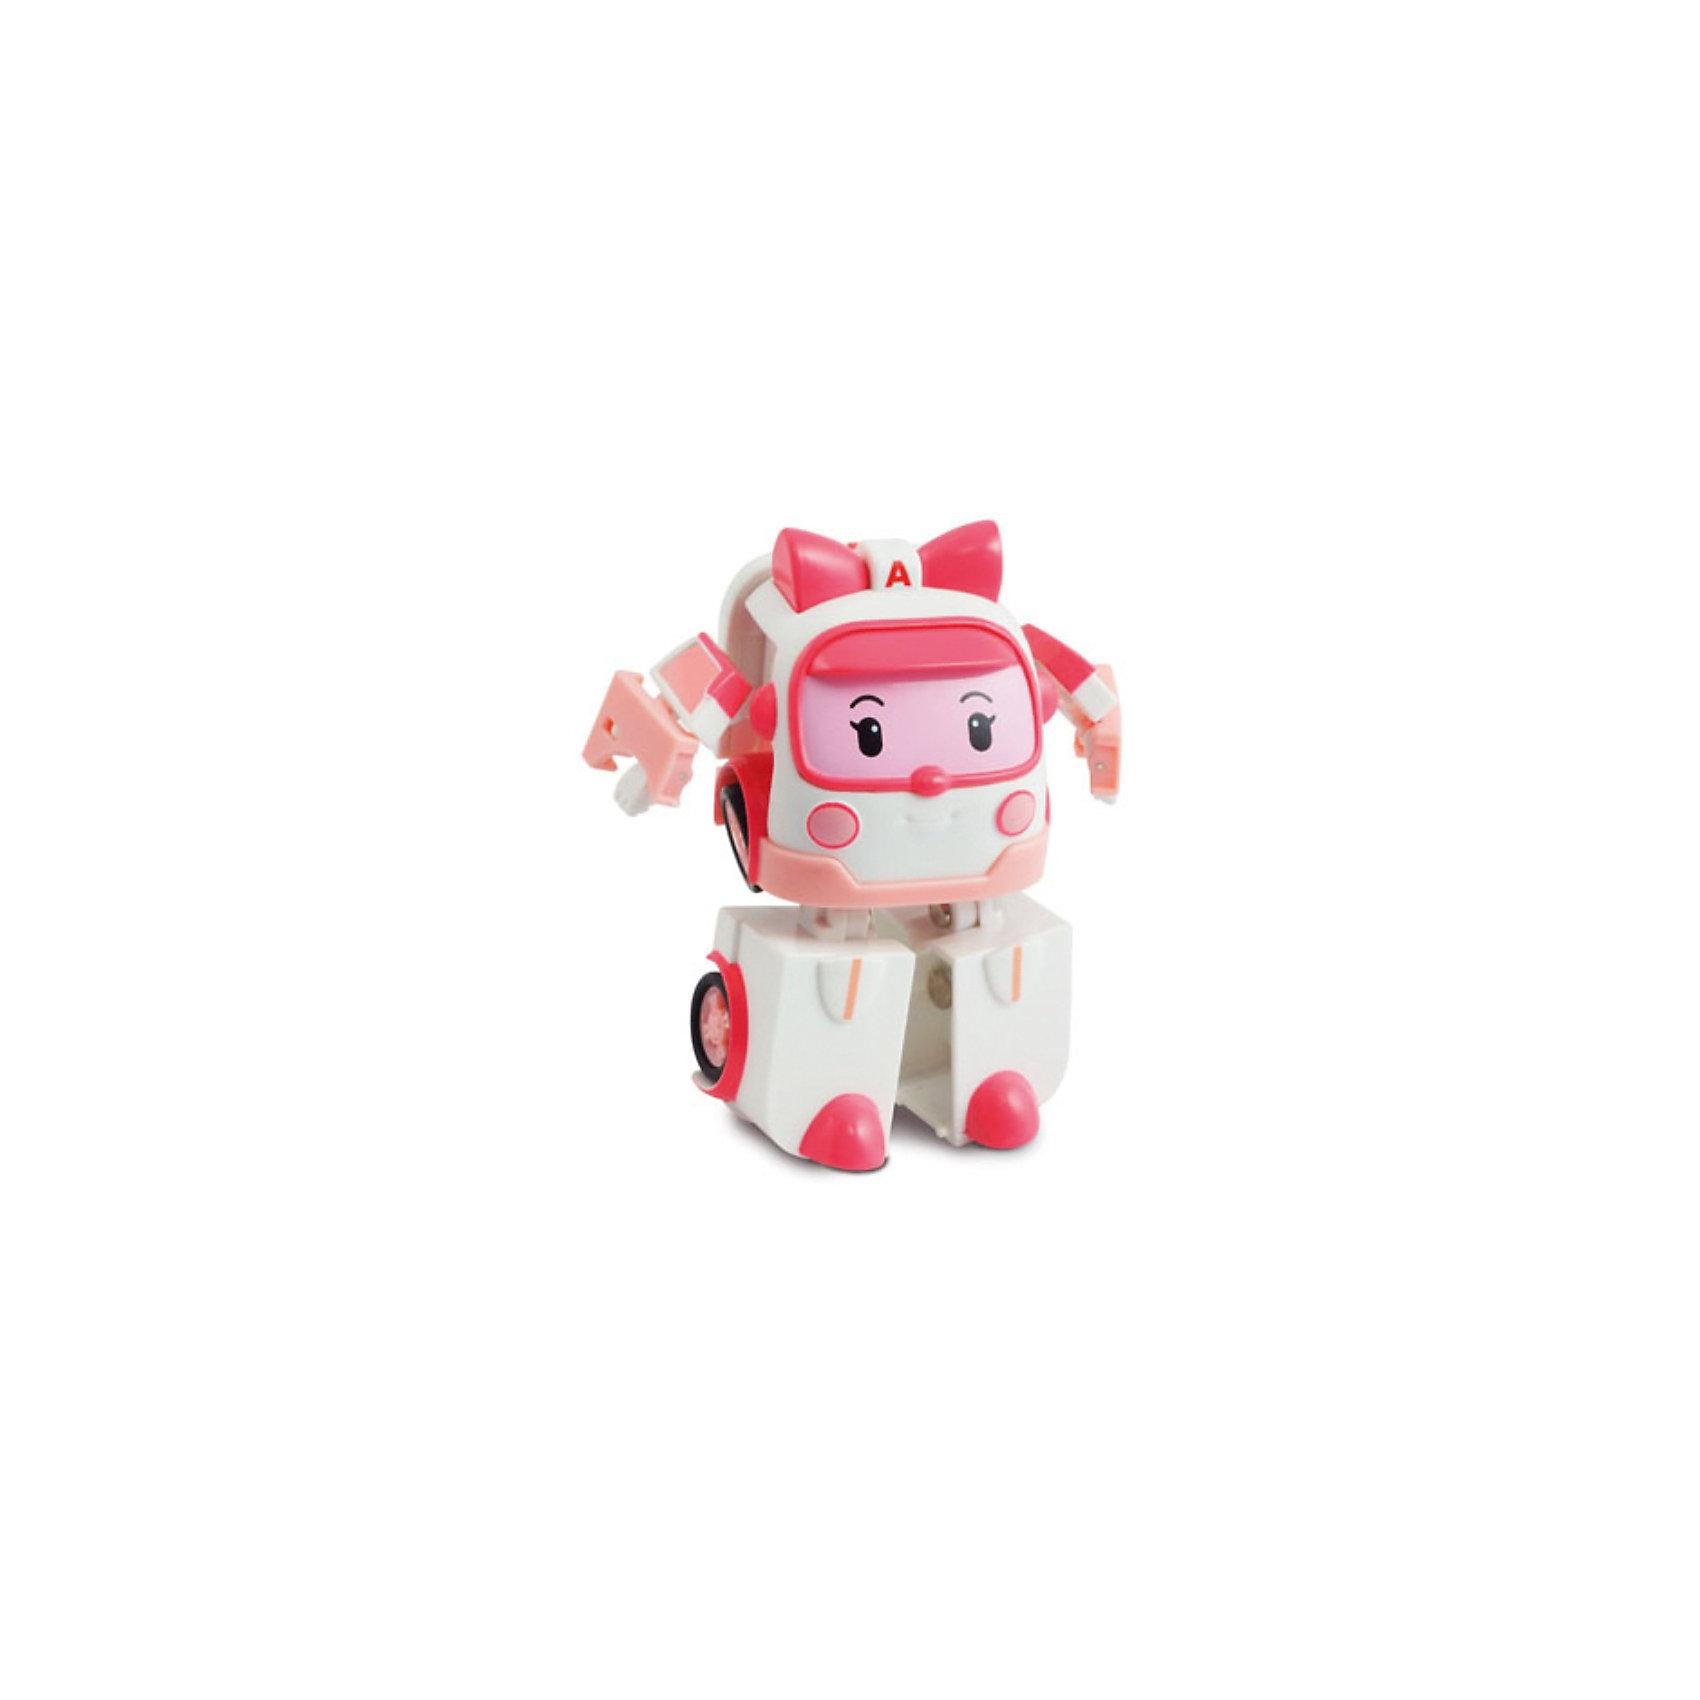 Silverlit Игрушка Эмбер трансформер, 7,5 см,  Робокар Поли silverlit игрушка эмбер на радиоуправлении 15см робокар поли